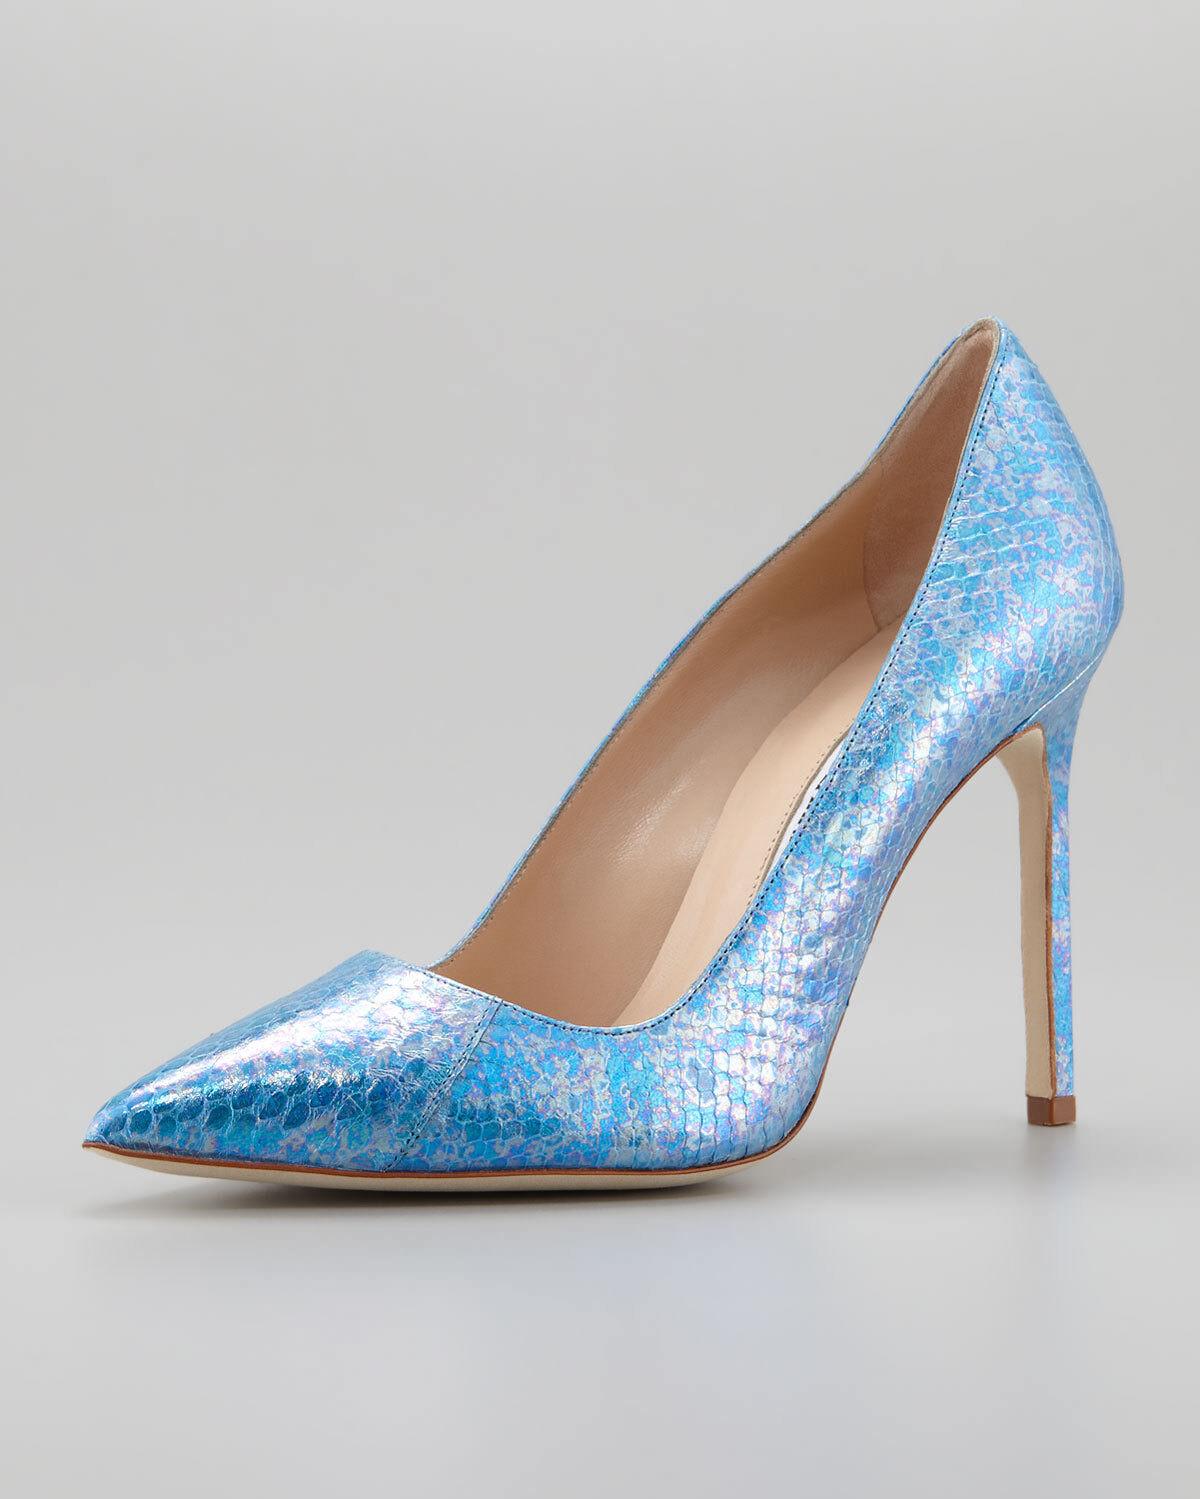 NEW Manolo Blahnik BB 105 EXOTIC Snakeskin PYTHON Pump bluee Heels shoes 37